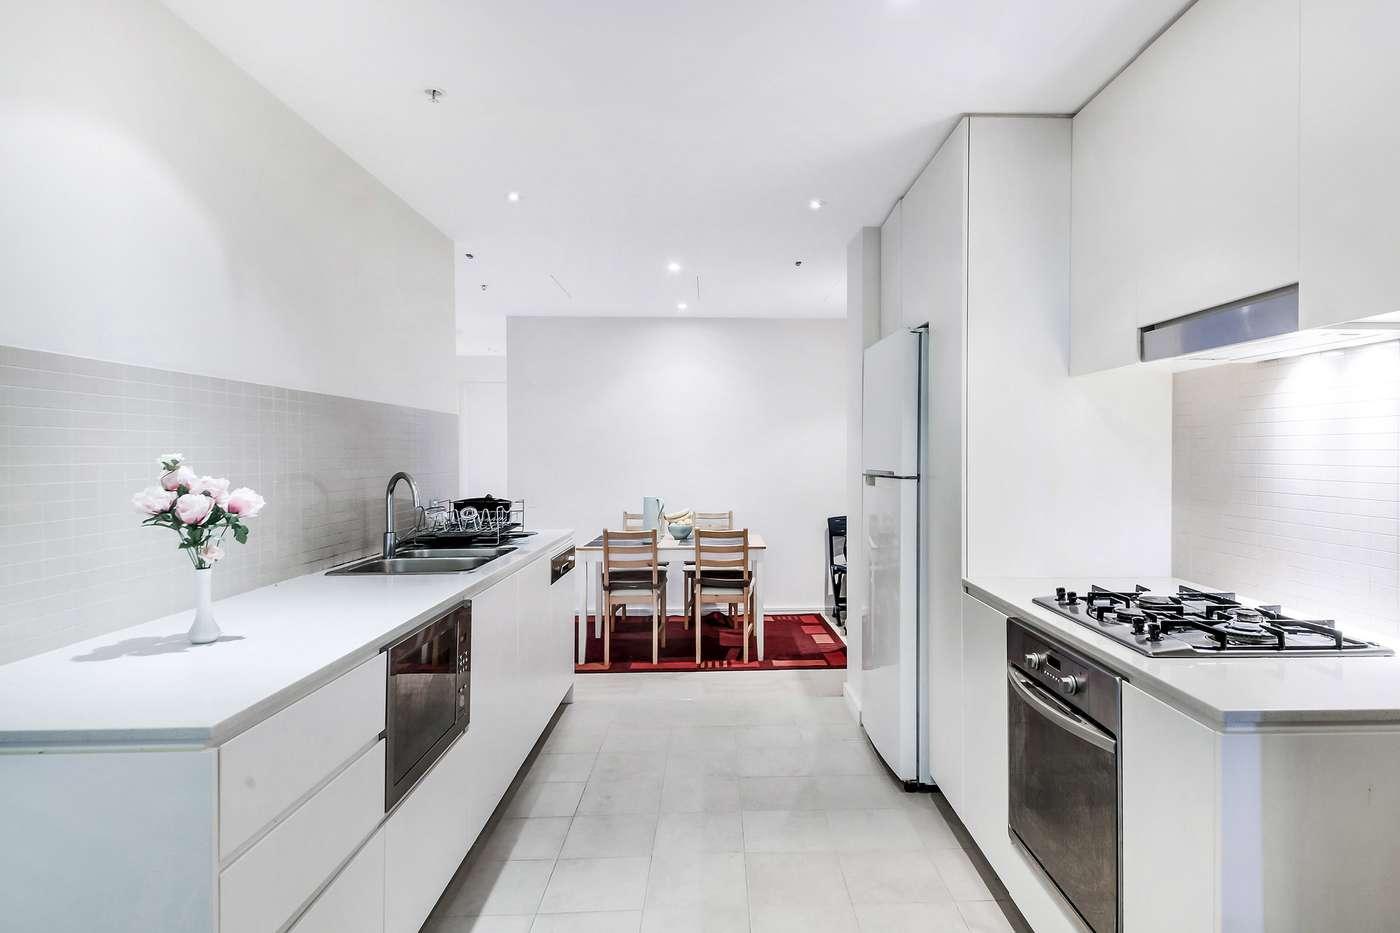 Main view of Homely apartment listing, 201B/1 Jack Brabham Drive, Hurstville, NSW 2220